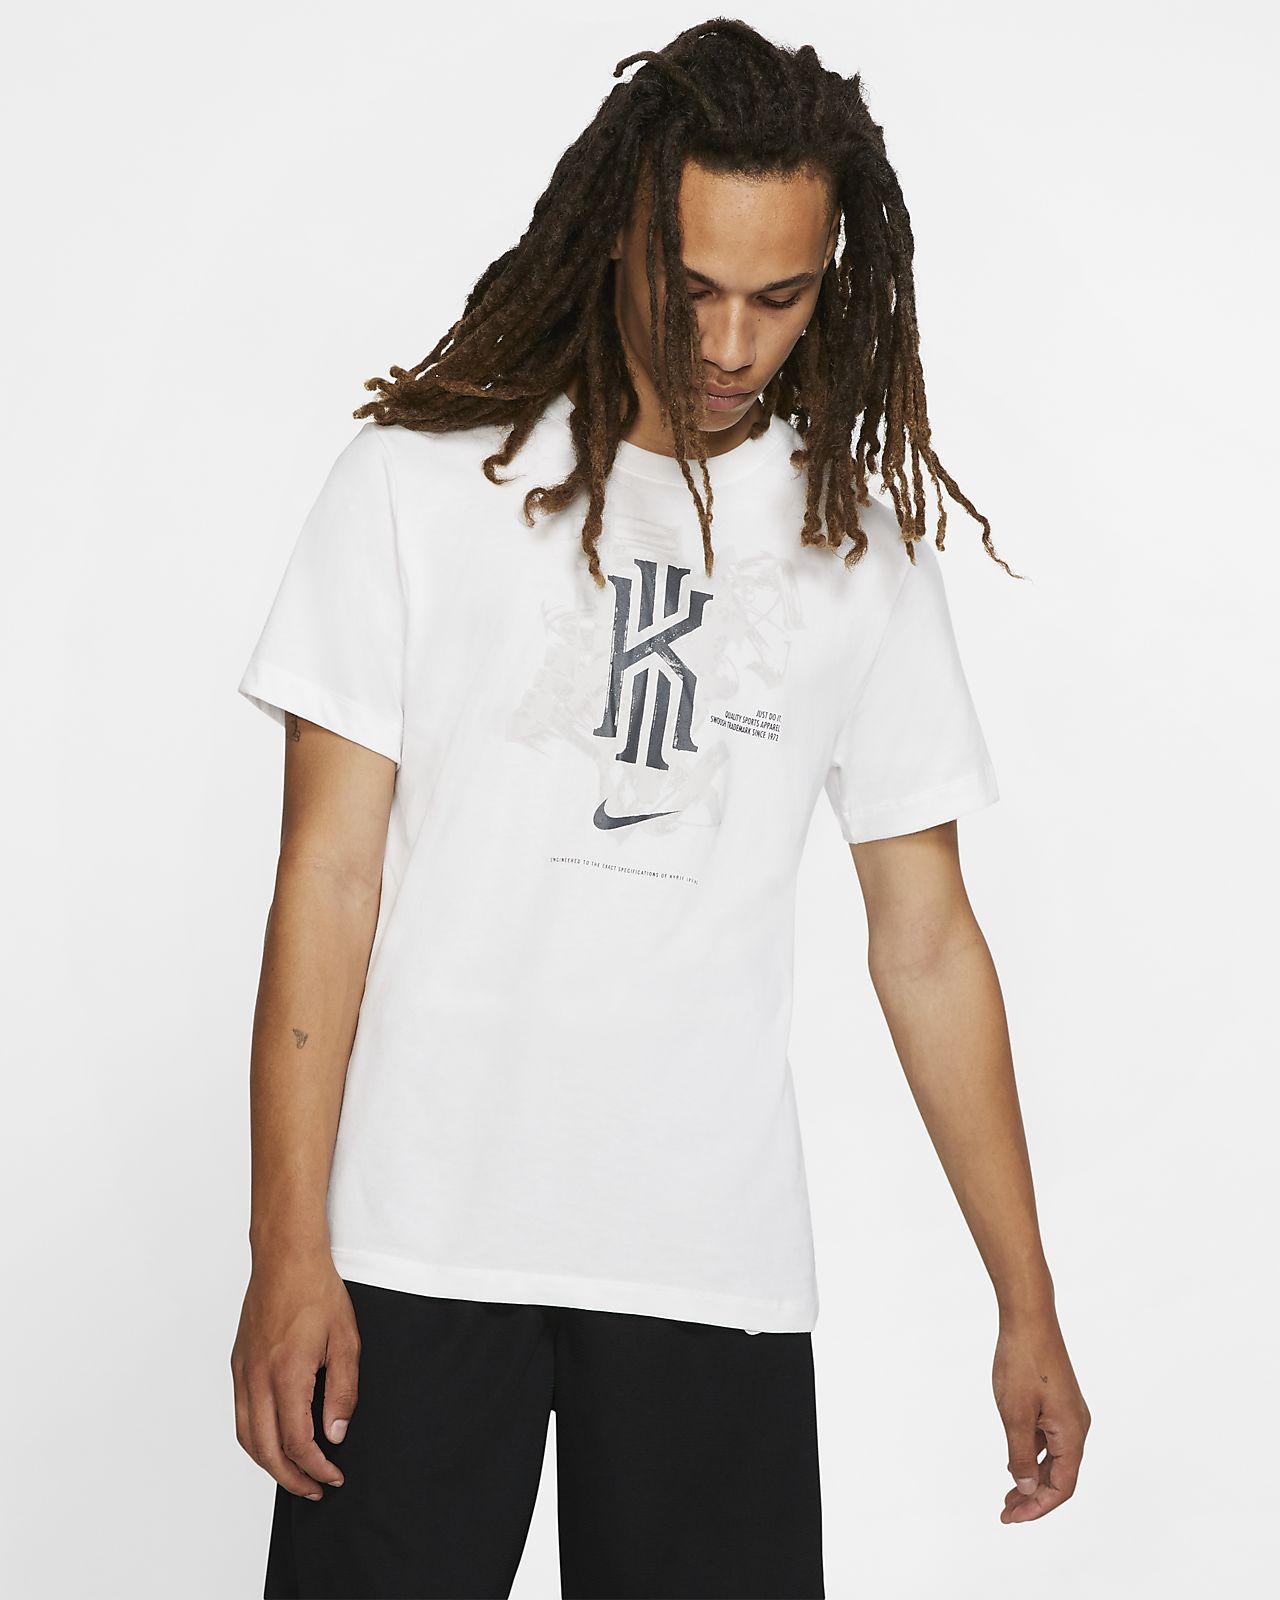 Tee-shirt de basketball Nike Dri-FIT Kyrie pour Homme